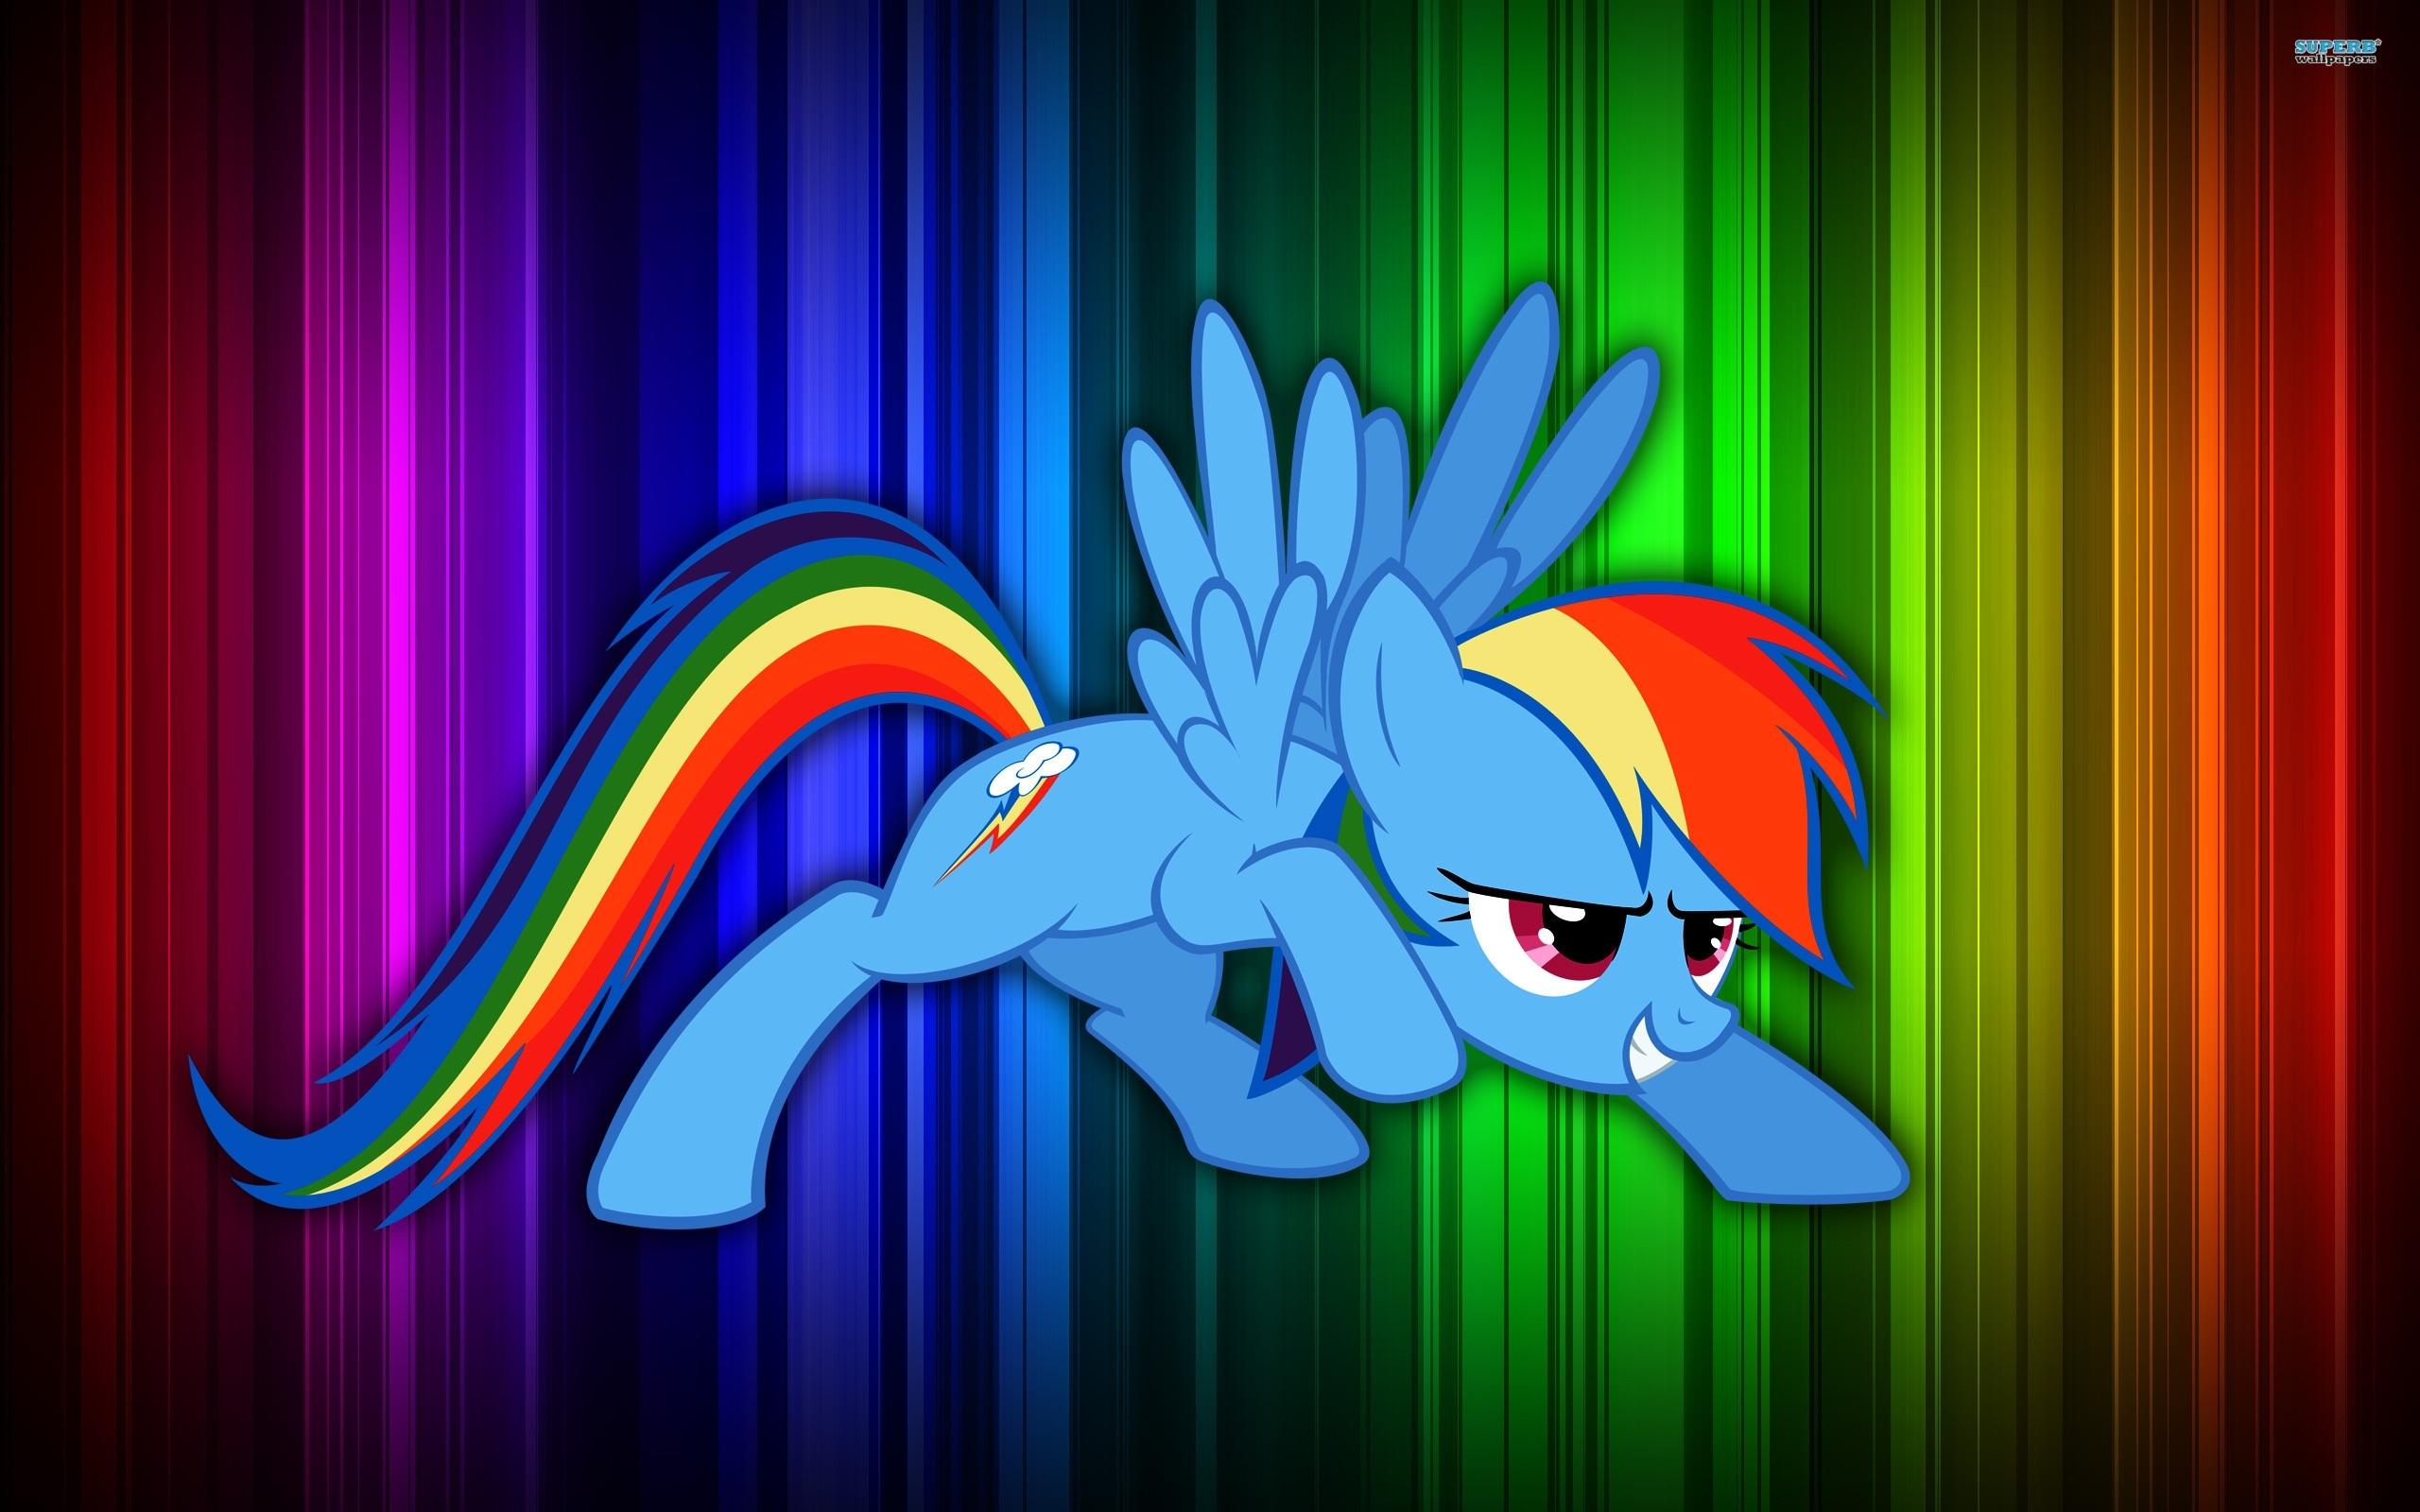 my little pony-rainbow dash images rainbow dash rainbow style hd